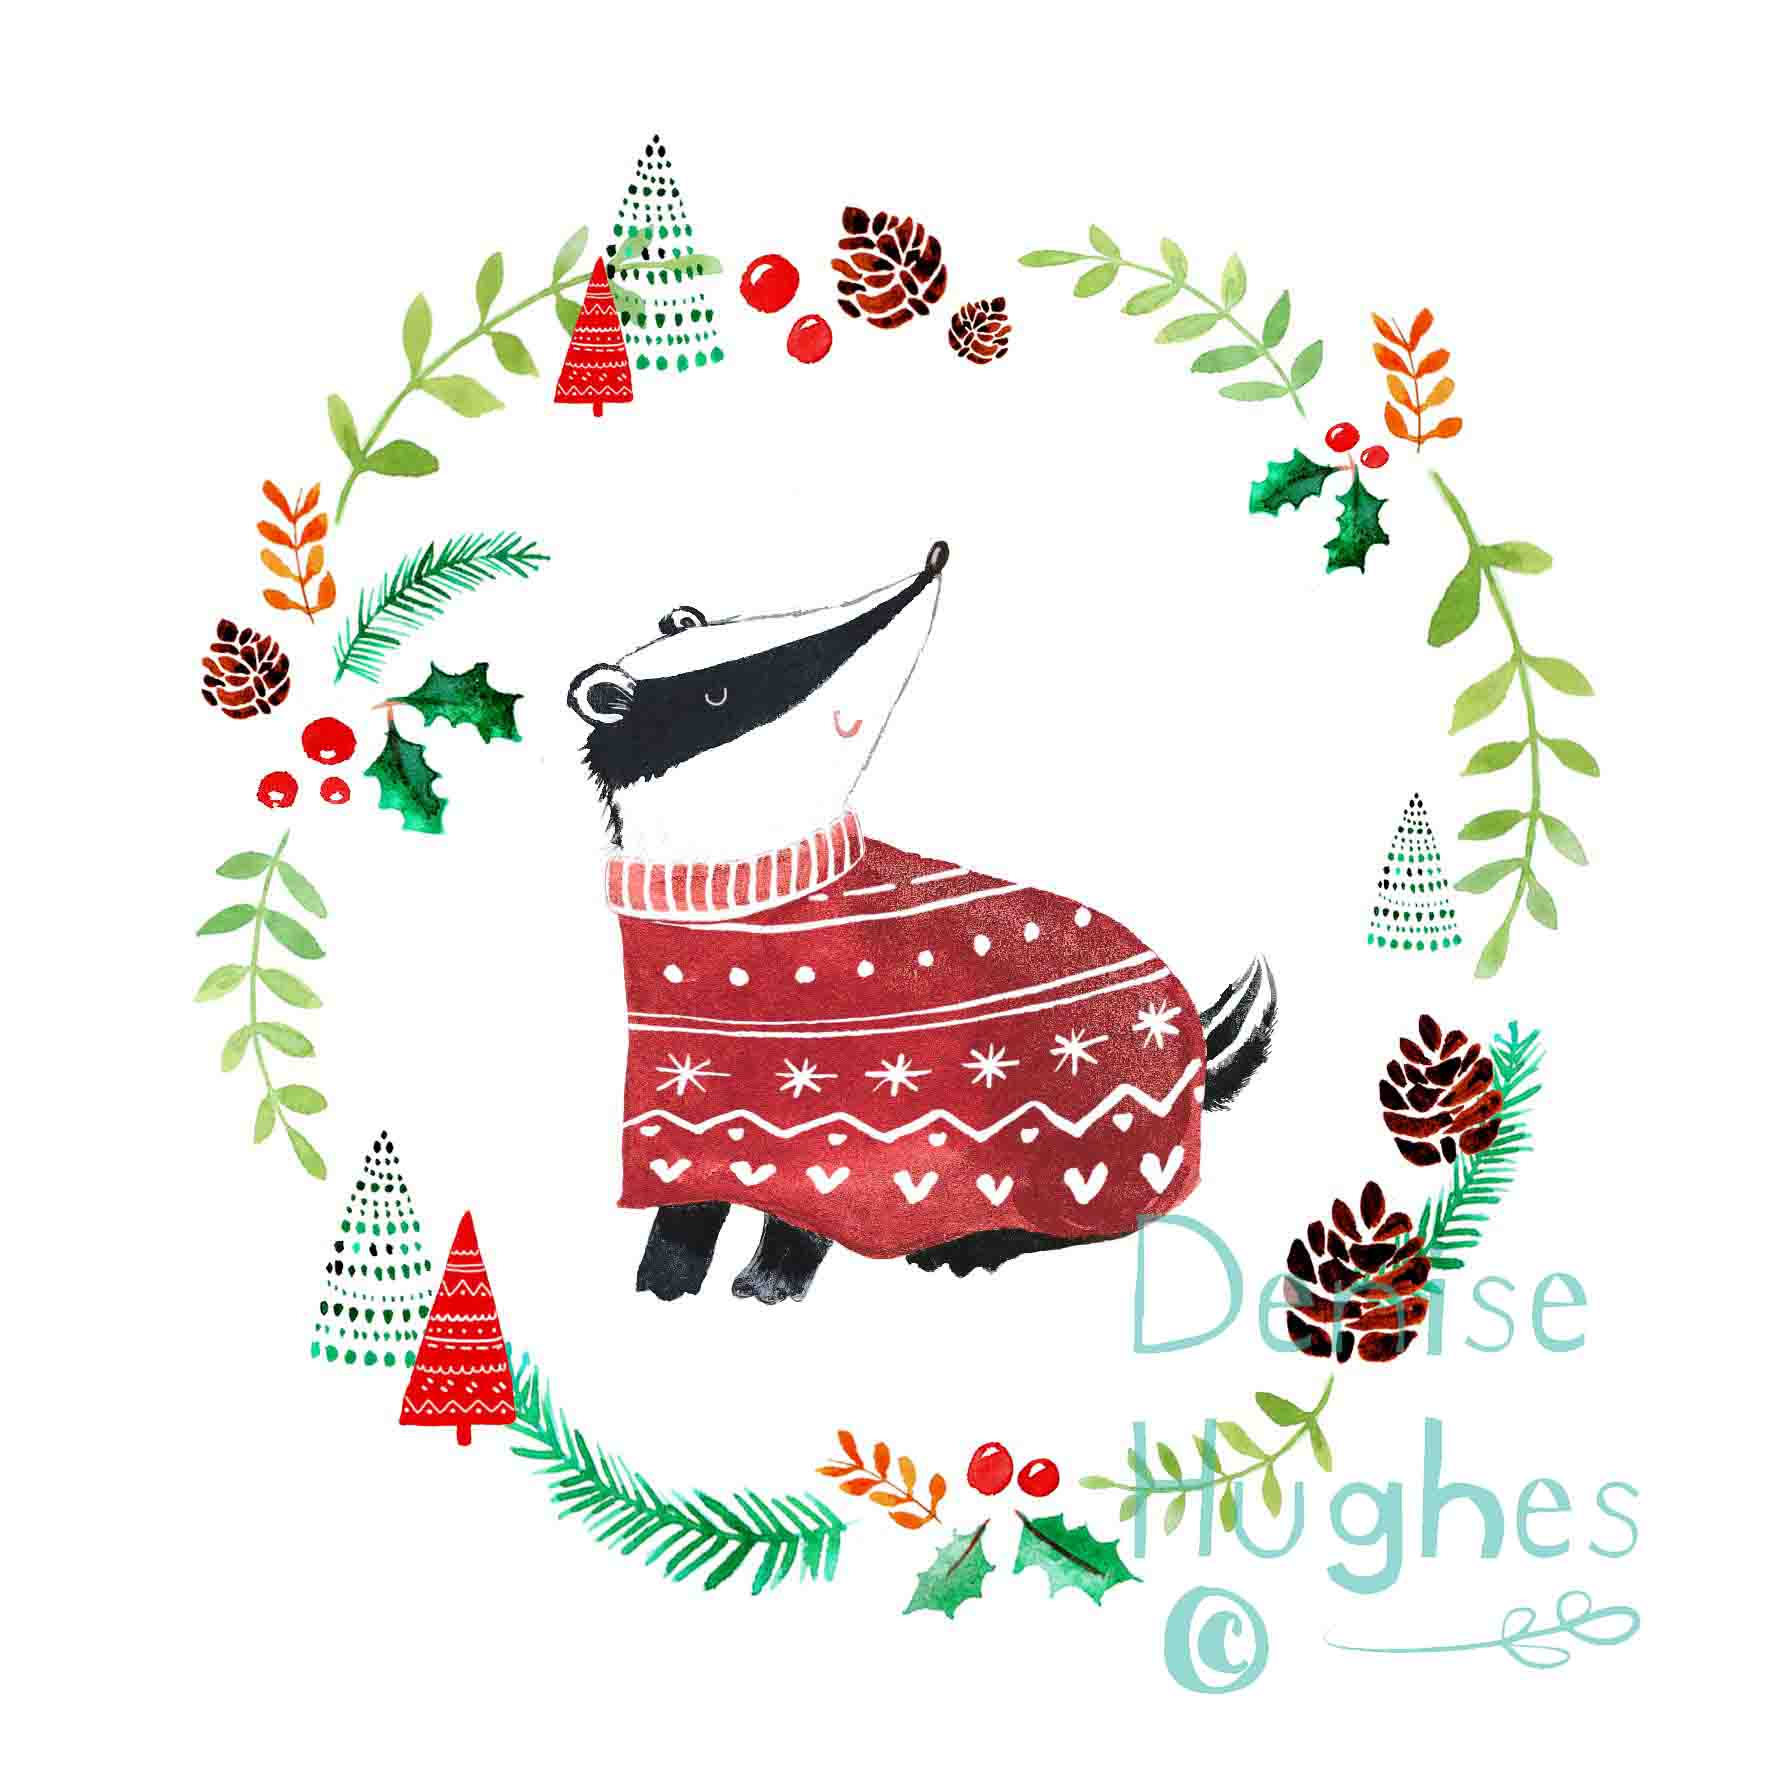 Woodland Christmas badger.jpg